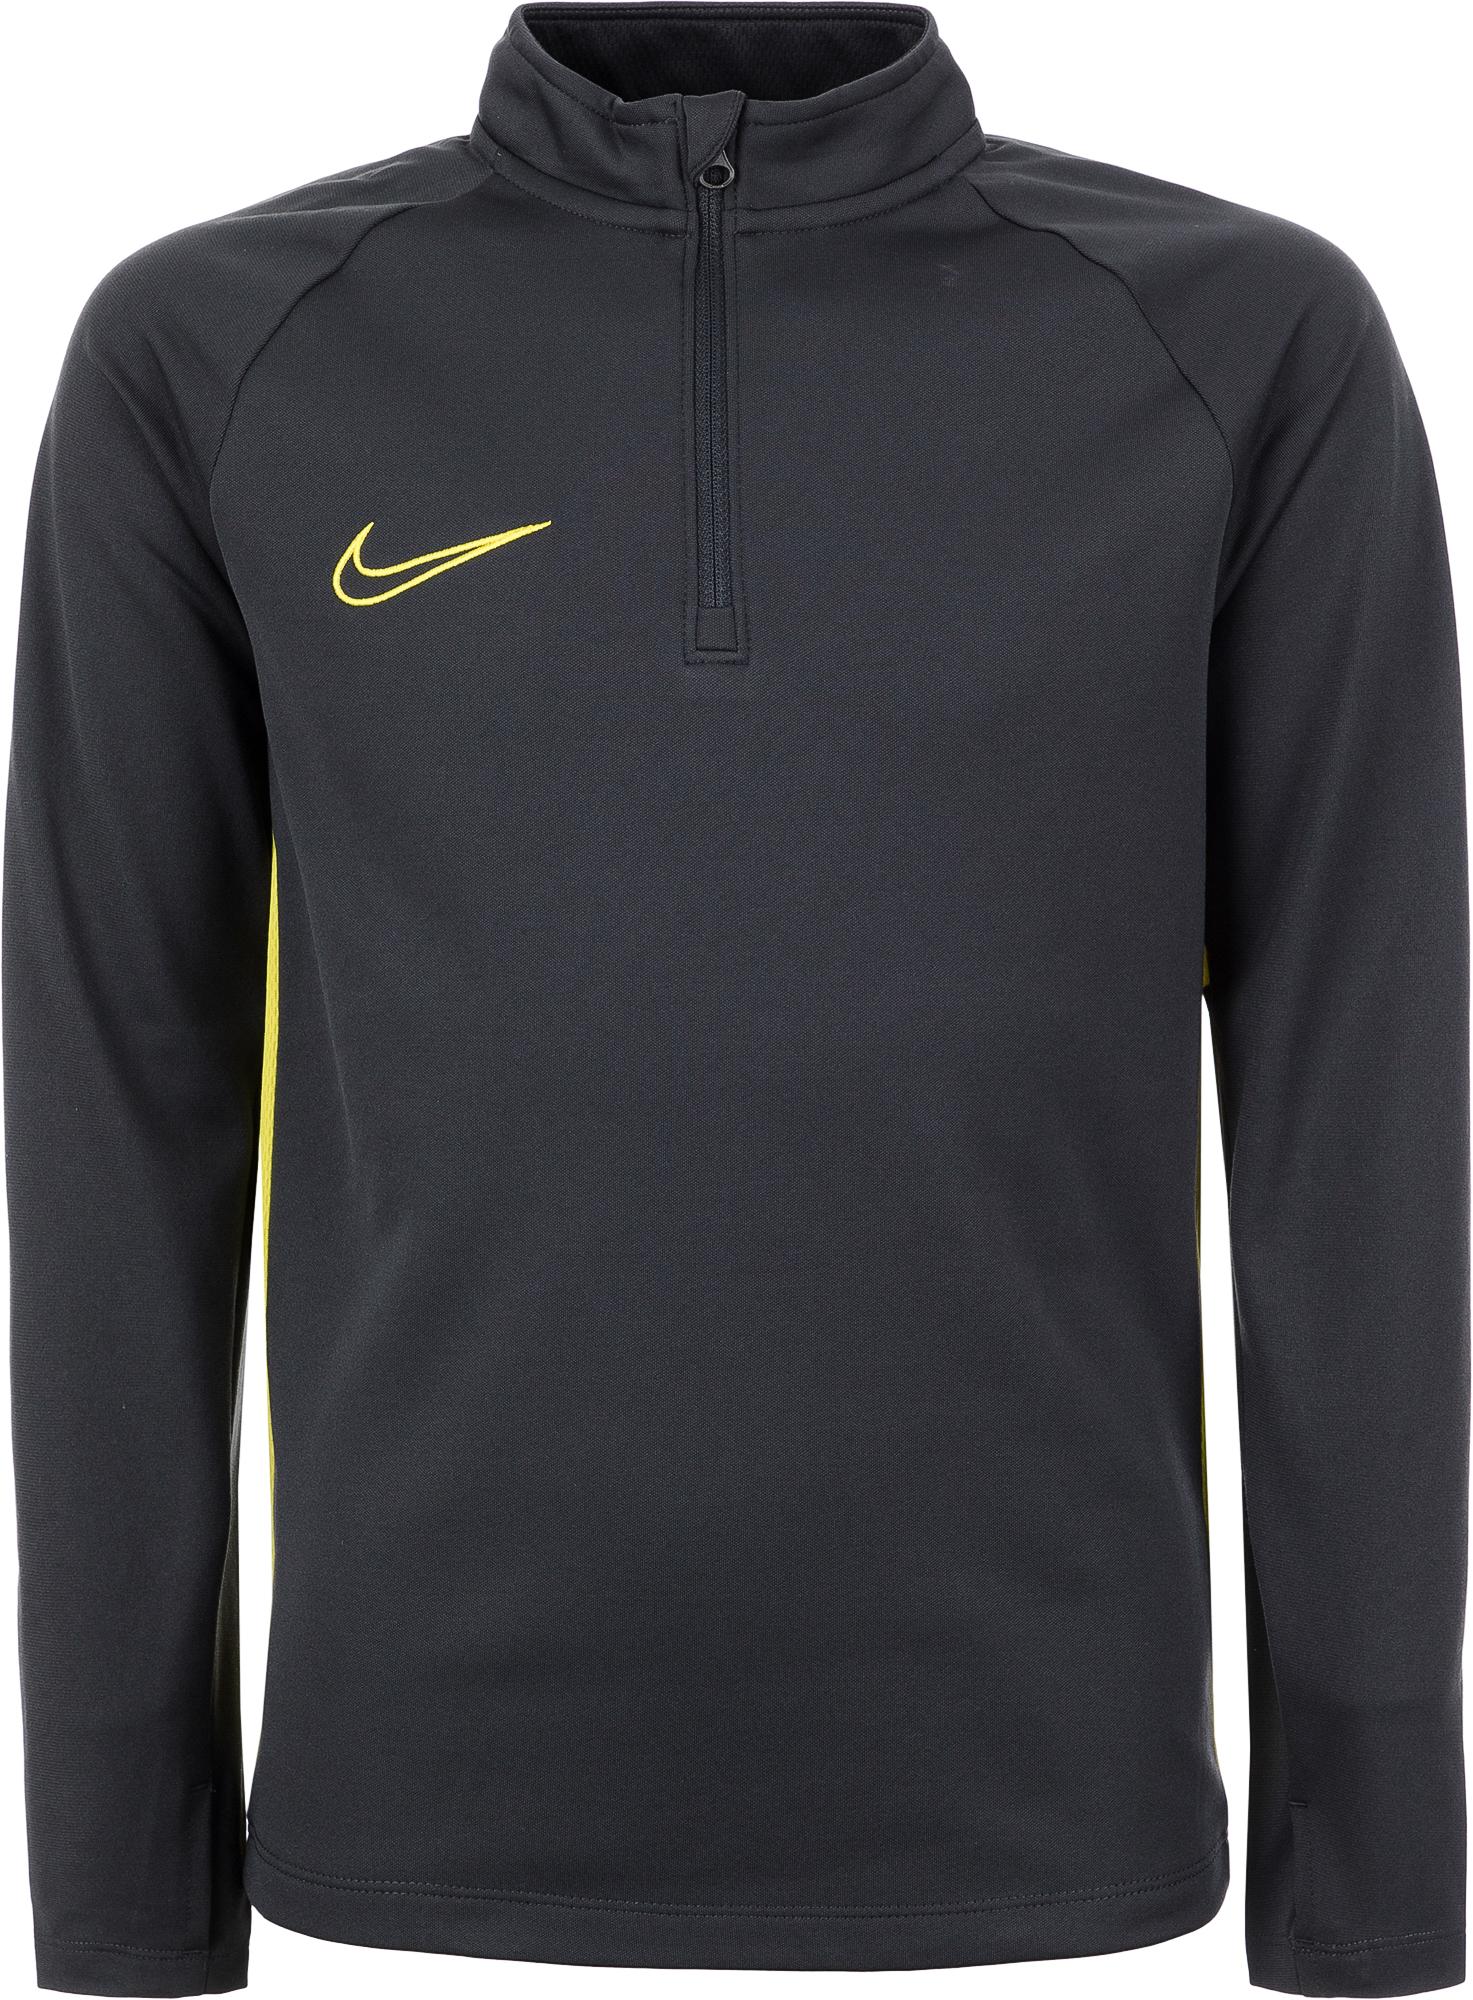 Nike Джемпер для мальчиков Nike Academy, размер 158-170